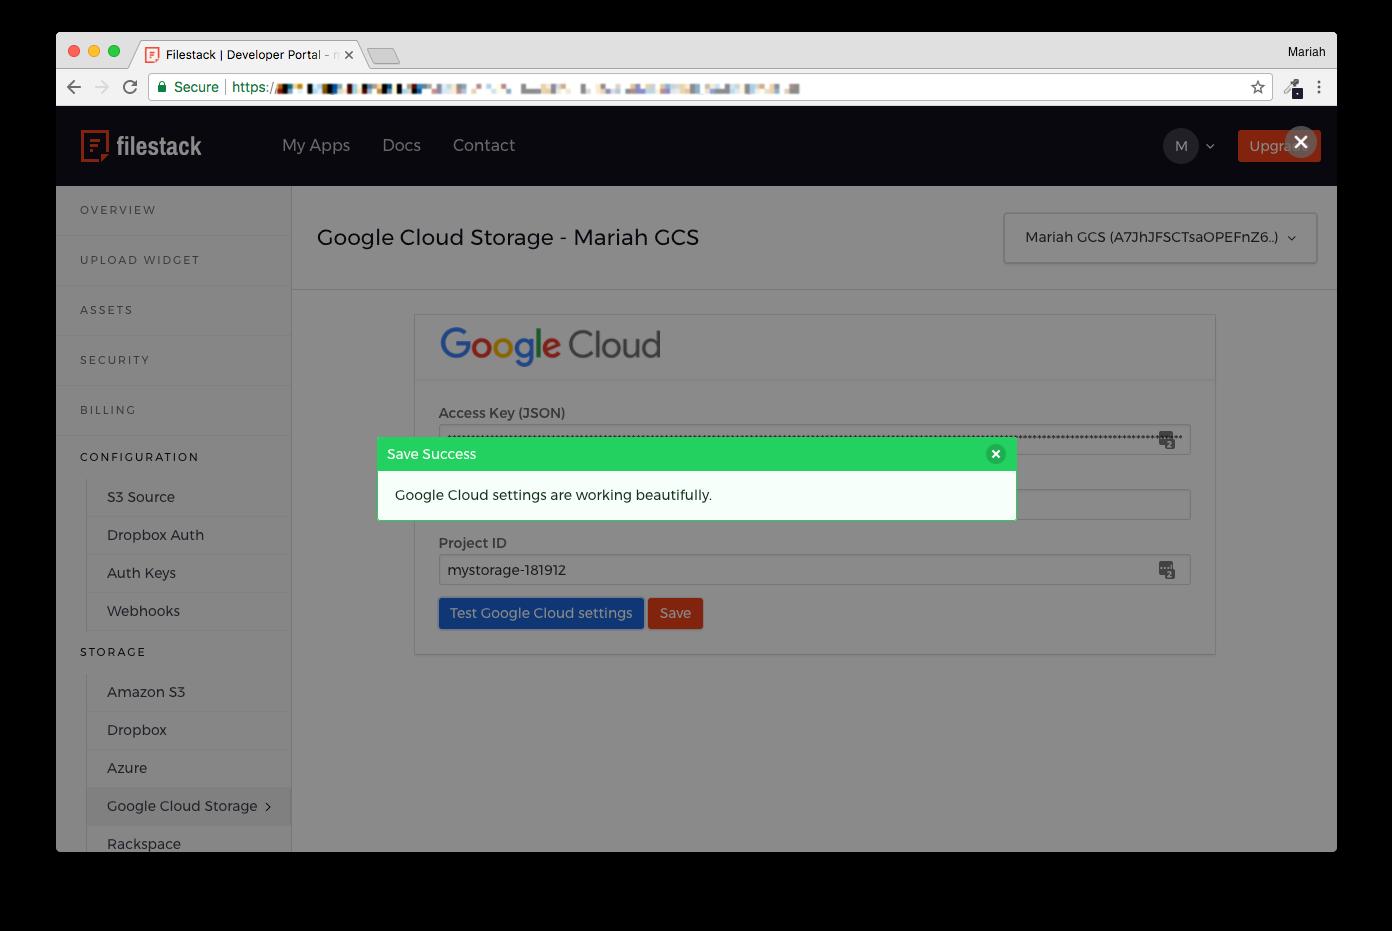 Screenshot showing entry of GCS credentials into Filestack Developer Portal